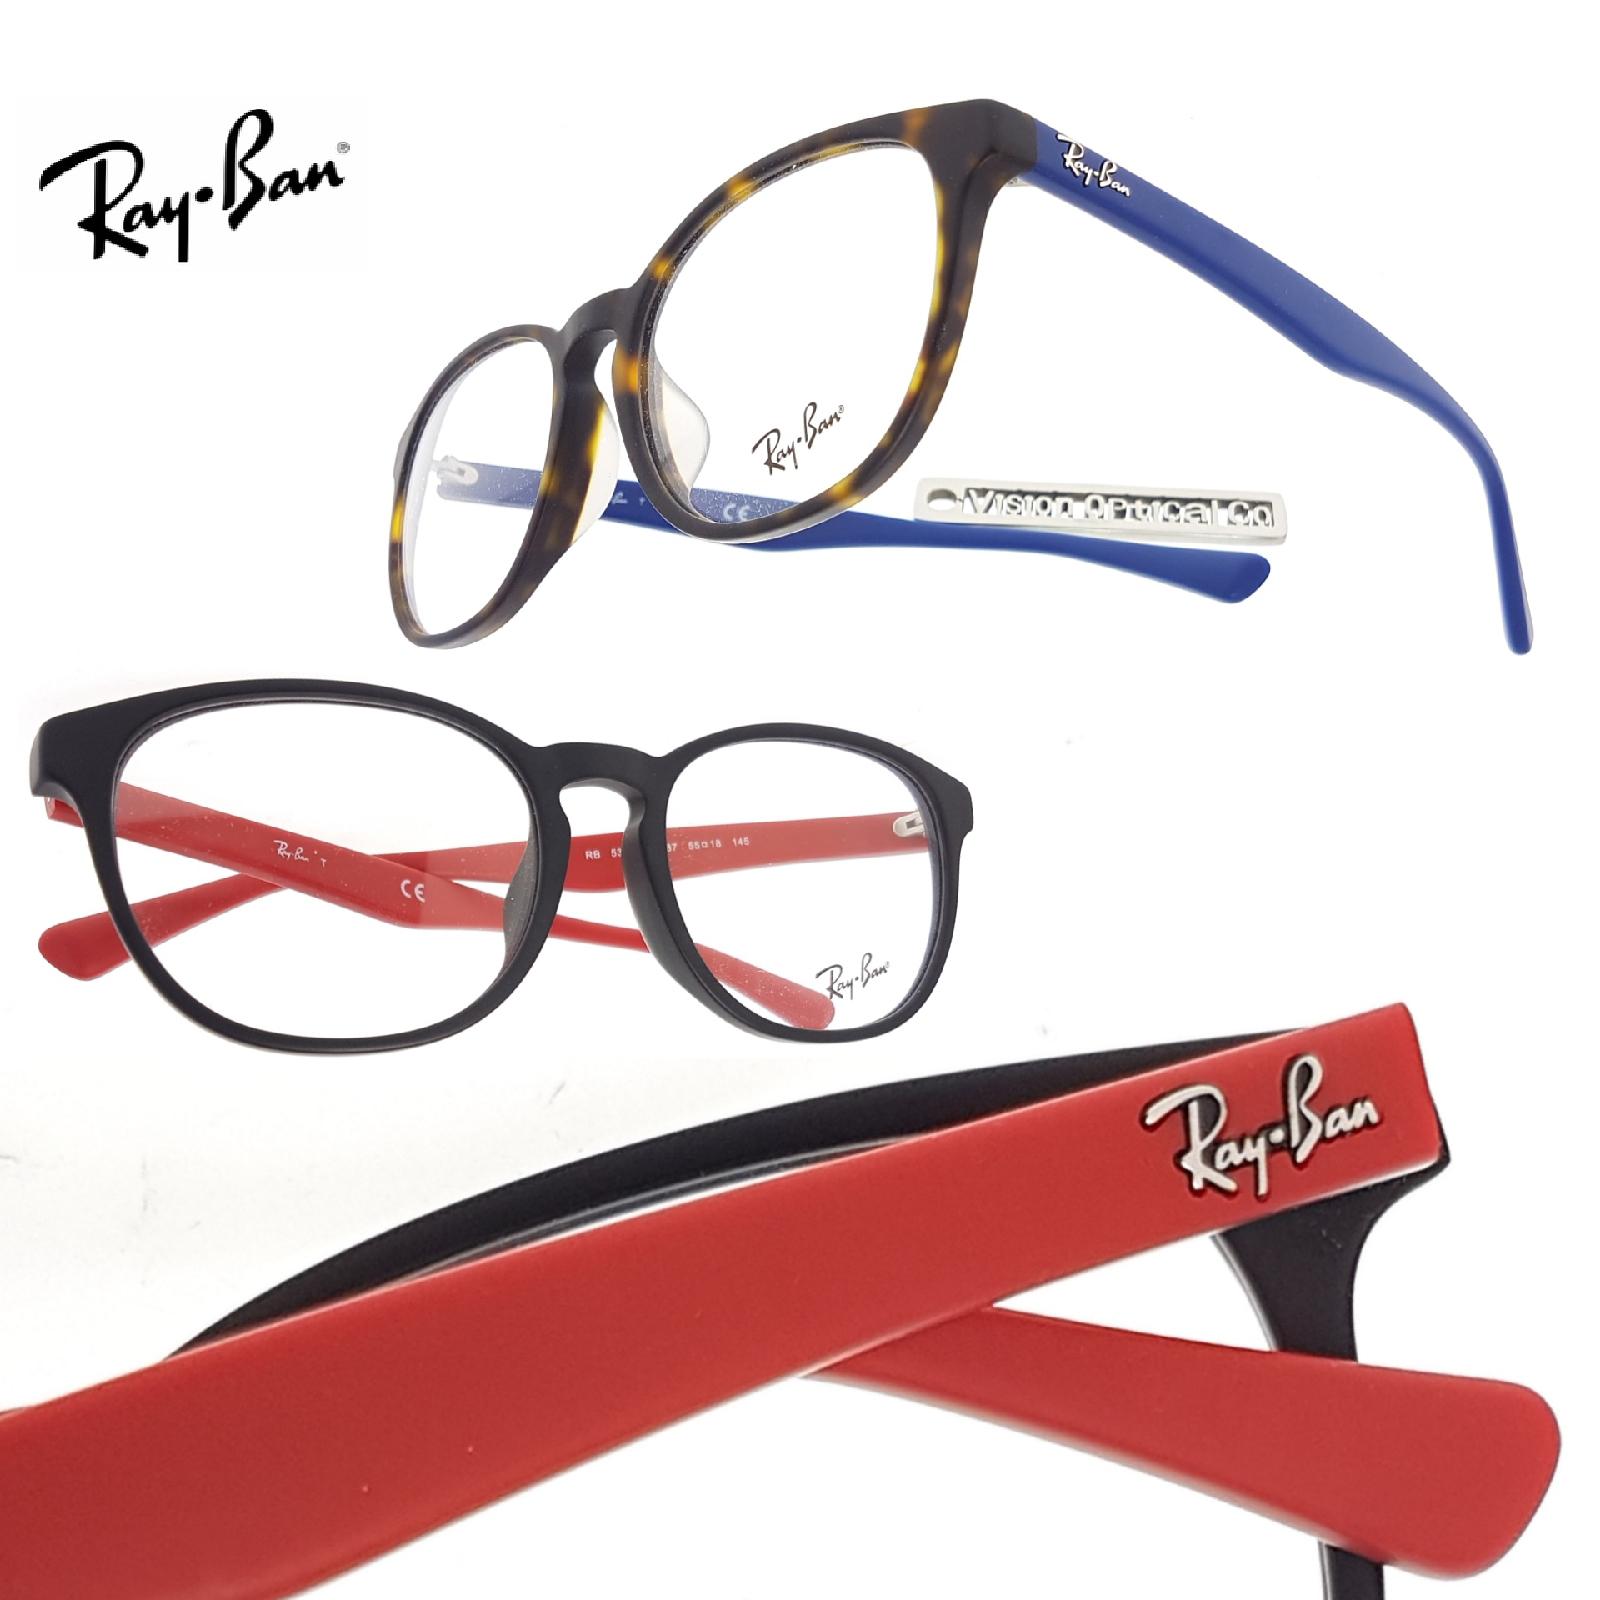 精明眼鏡公司: RAY BAN 眼鏡